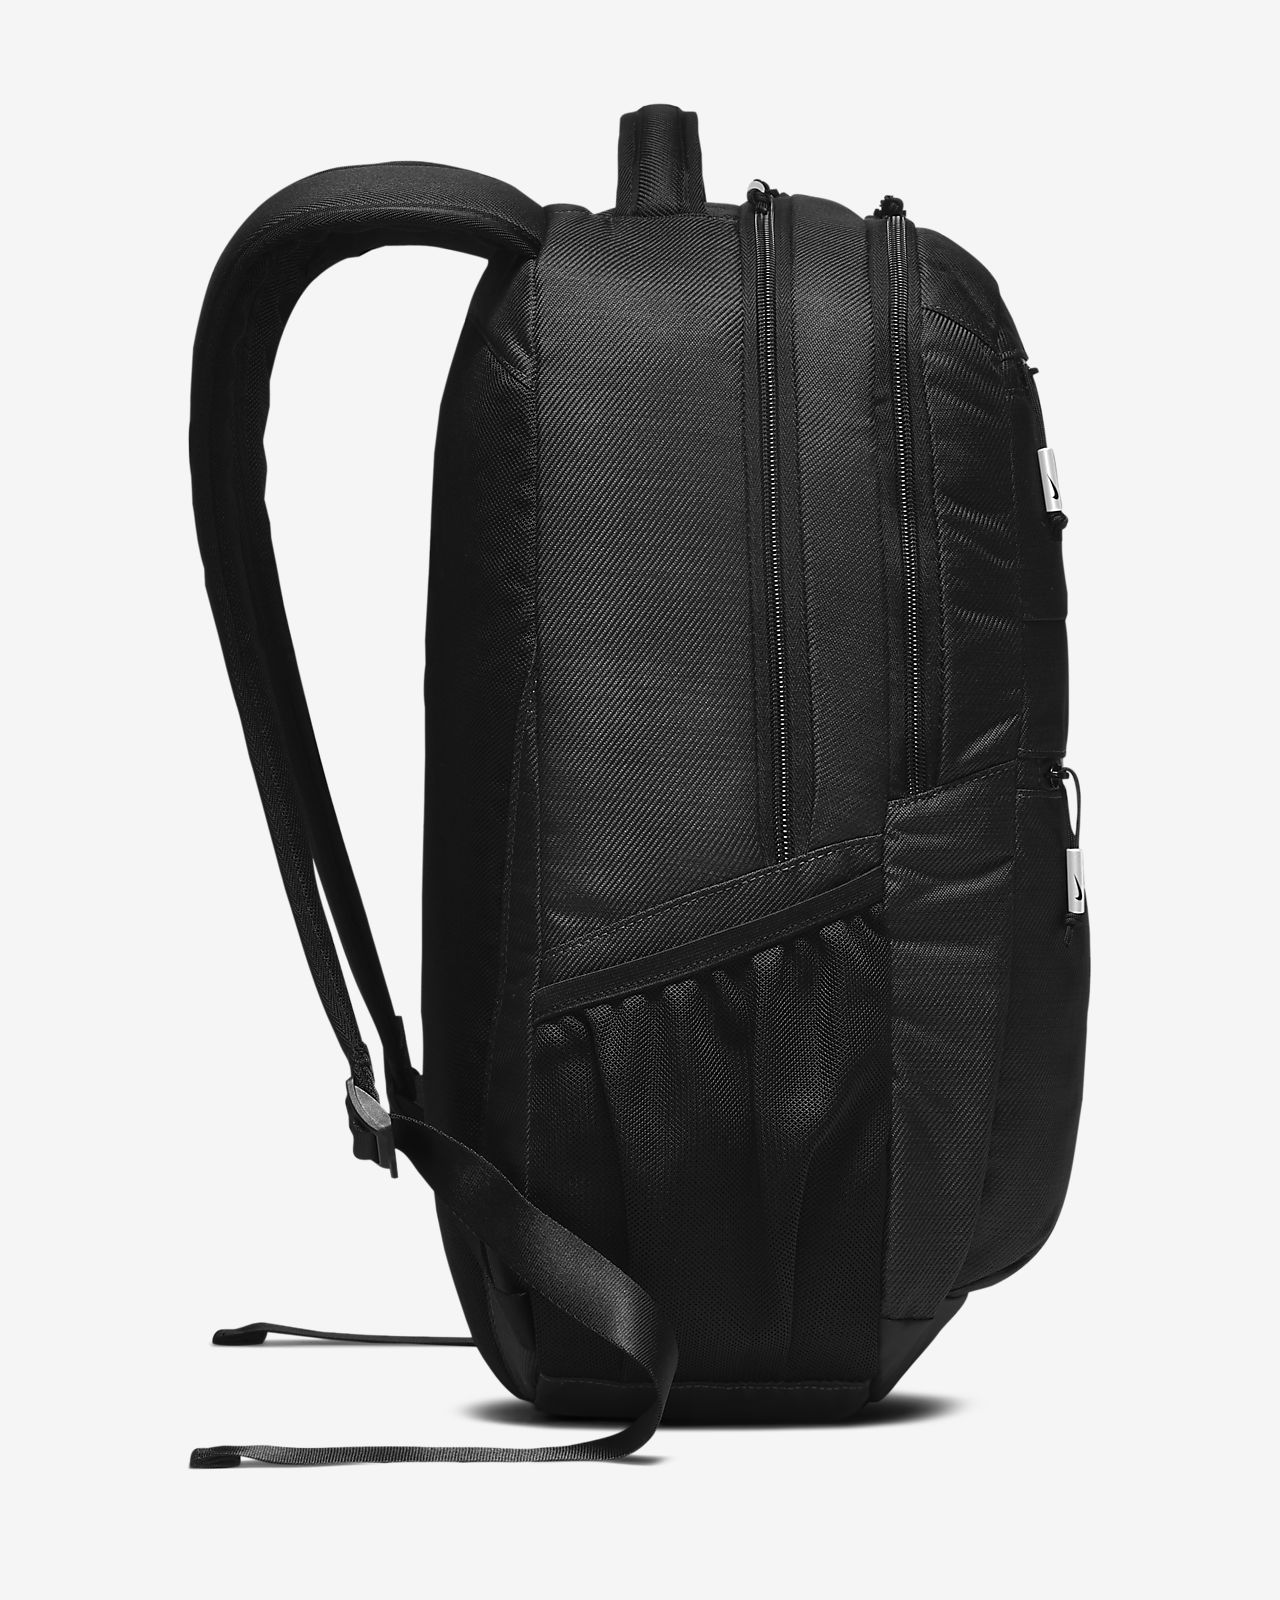 c679d6cbc5 Low Resolution Nike Departure Golf Backpack Nike Departure Golf Backpack